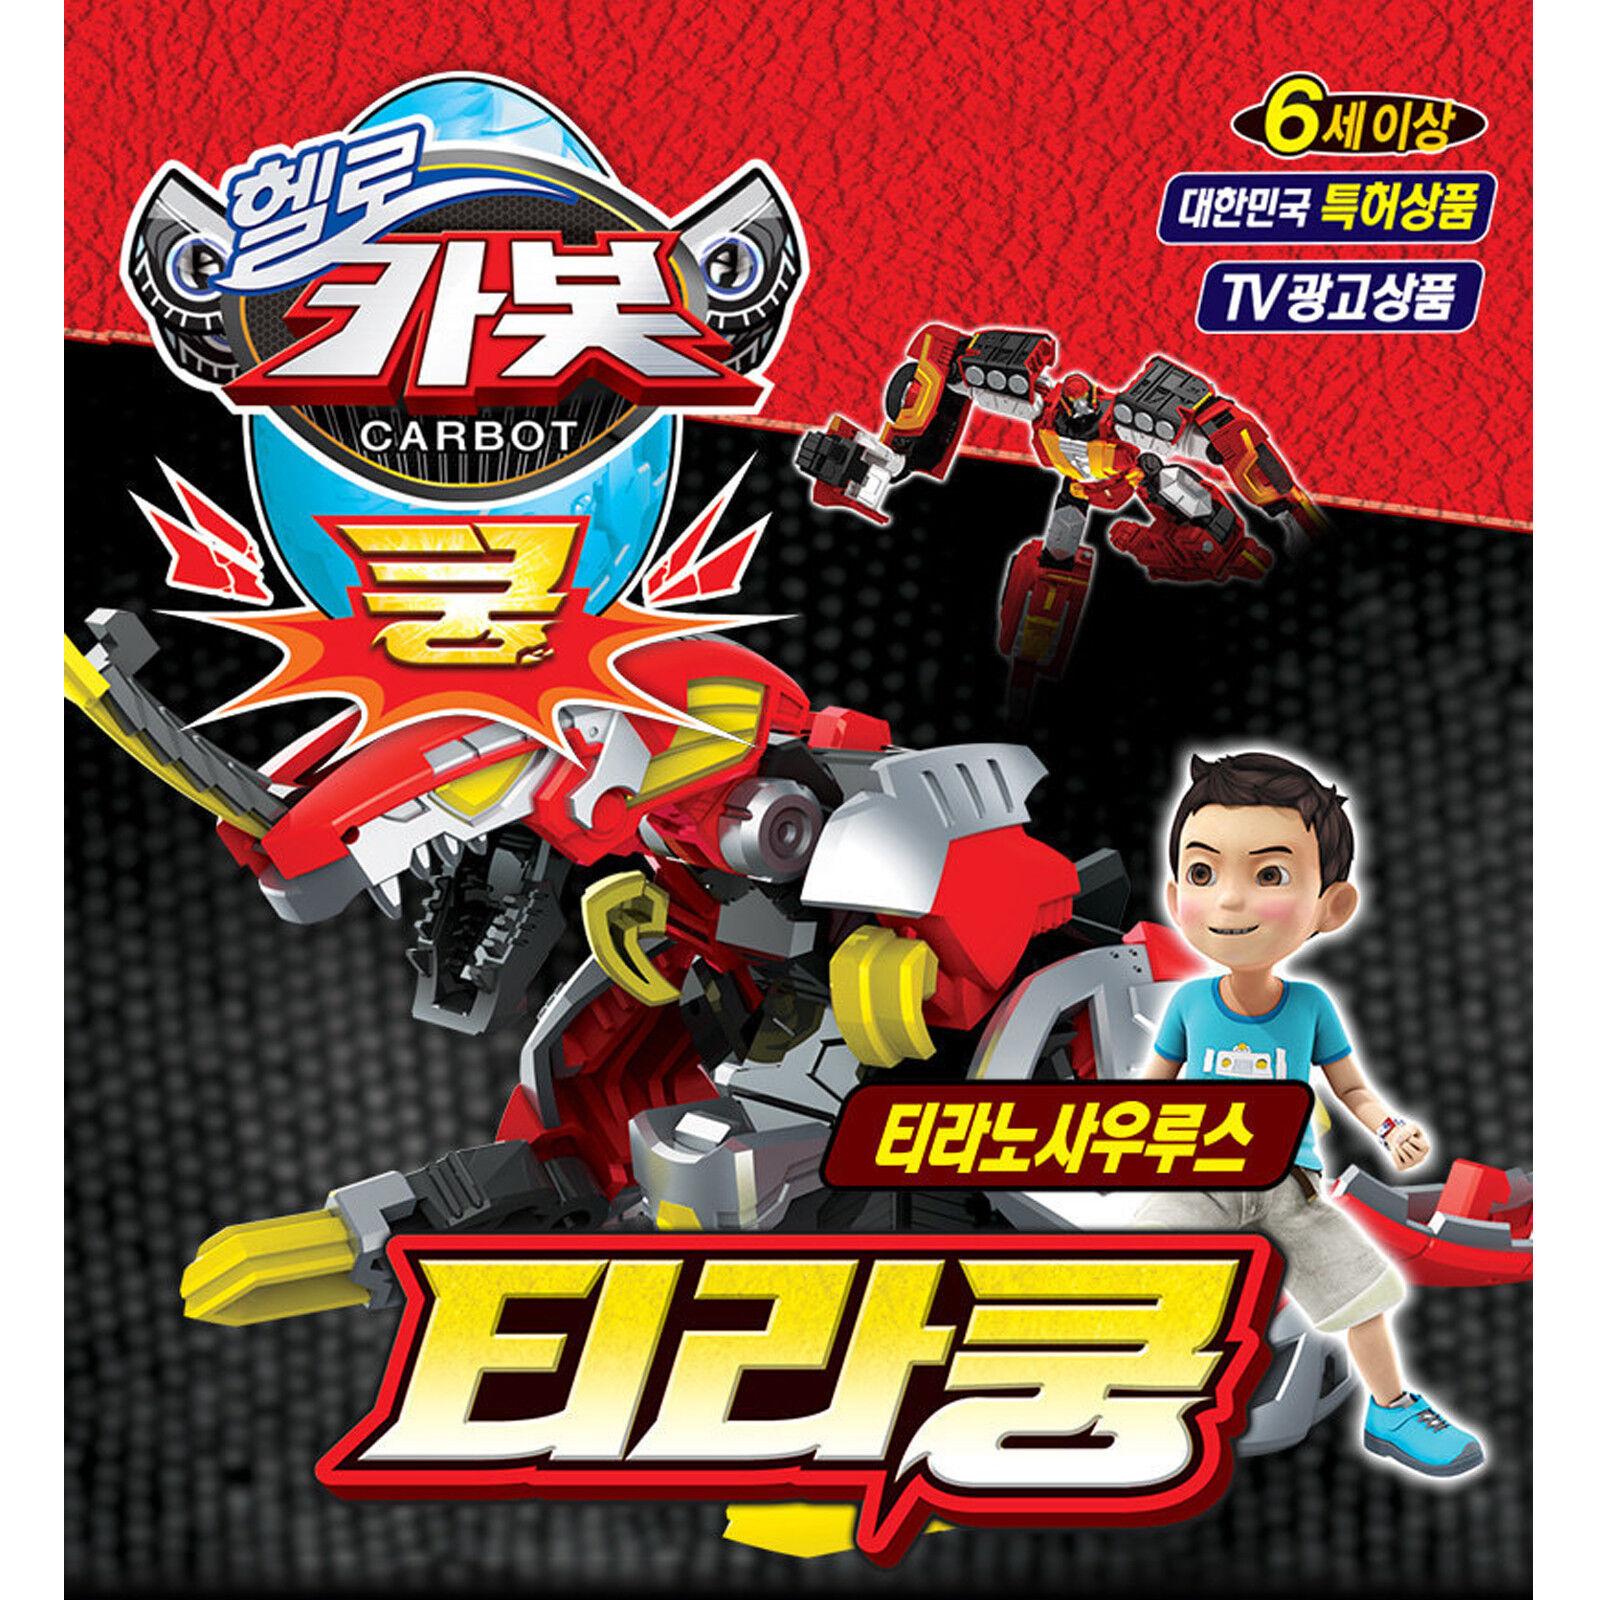 Carbot Tirakoong Transformer Robot Tyrannosaurus) Toy Action Figure (From Egg to Tyrannosaurus) Robot bfe478